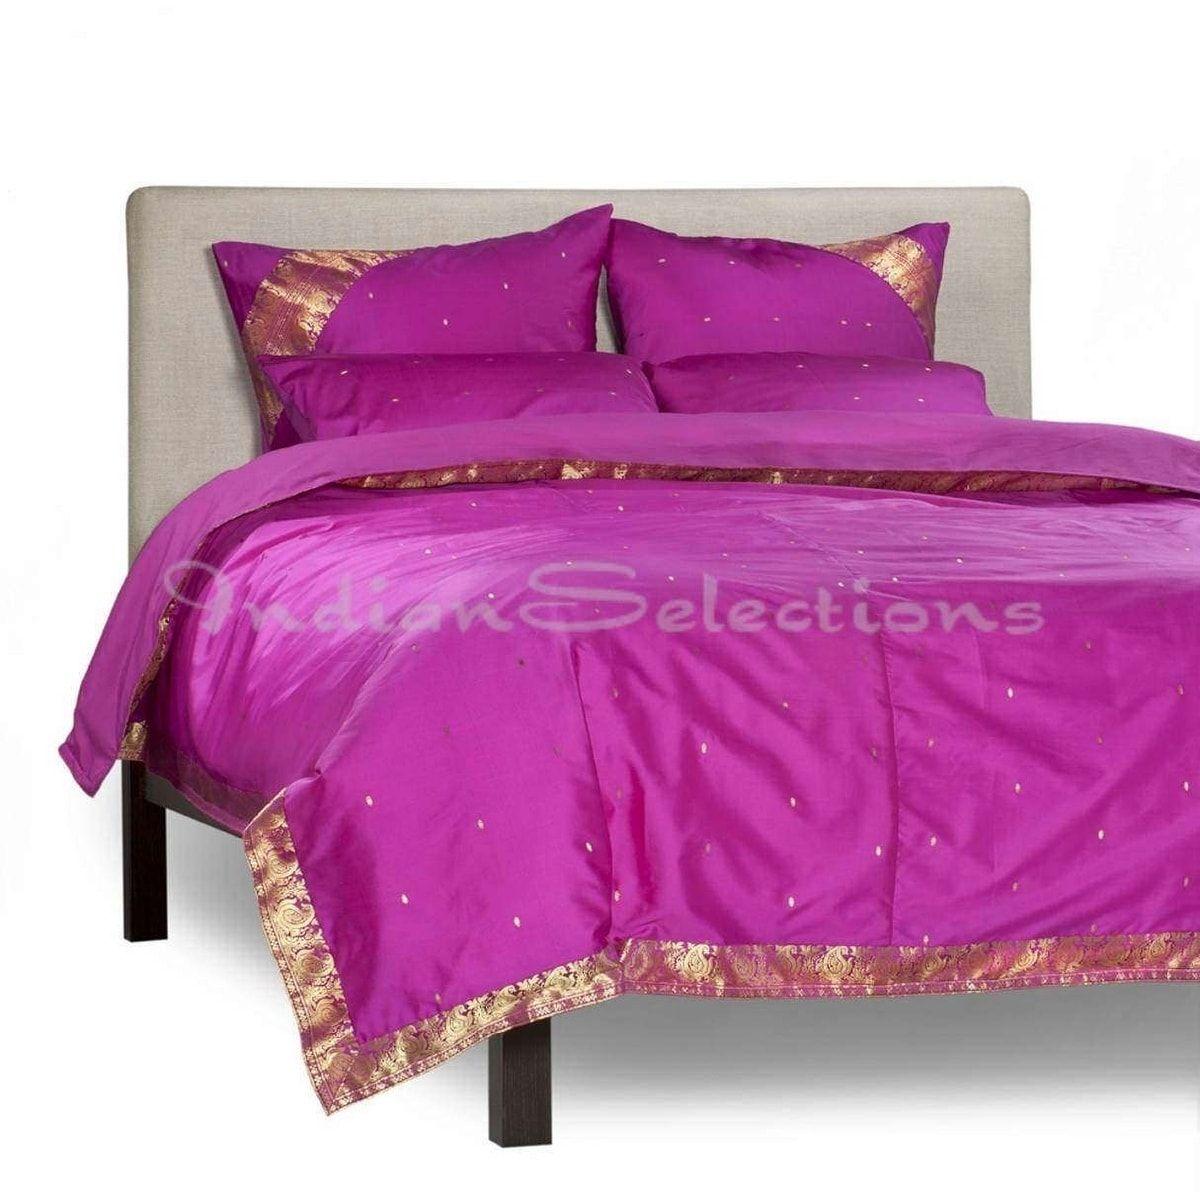 Indian selections violet red piece handmade sari duvet cover set